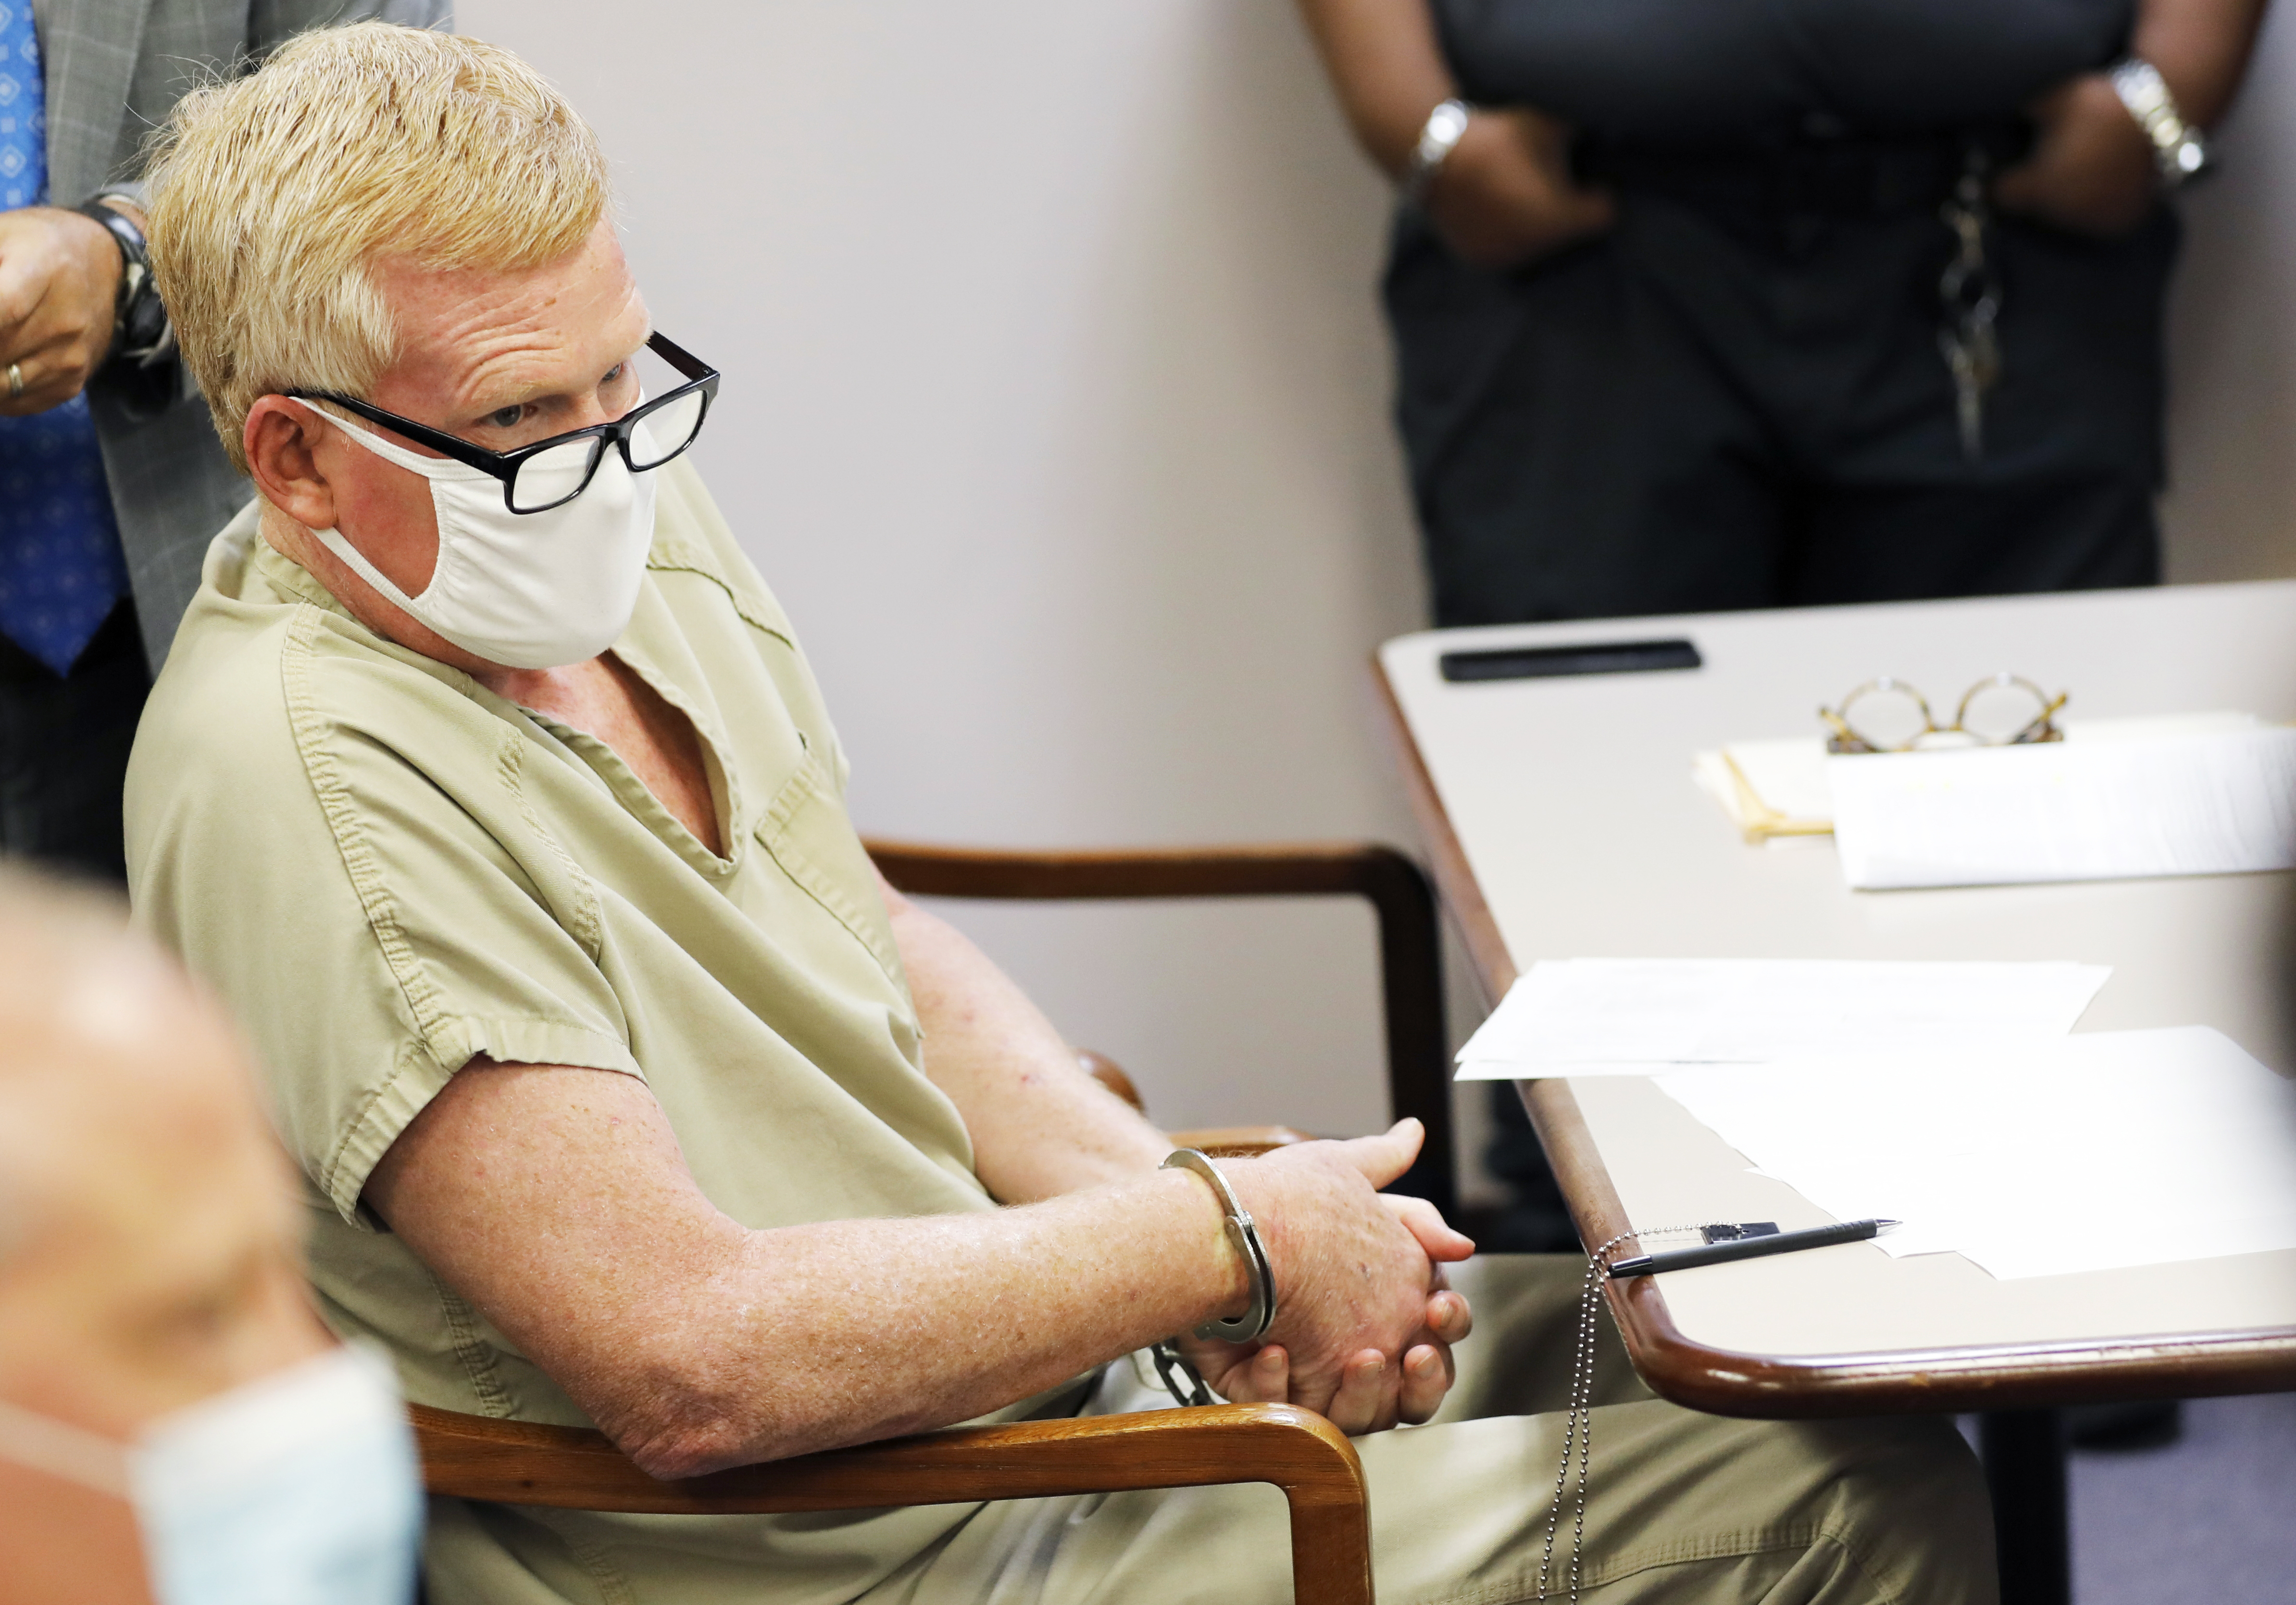 Alex Murdaugh at a bond on Sept. 16, 2021, in Varnville, S.C.